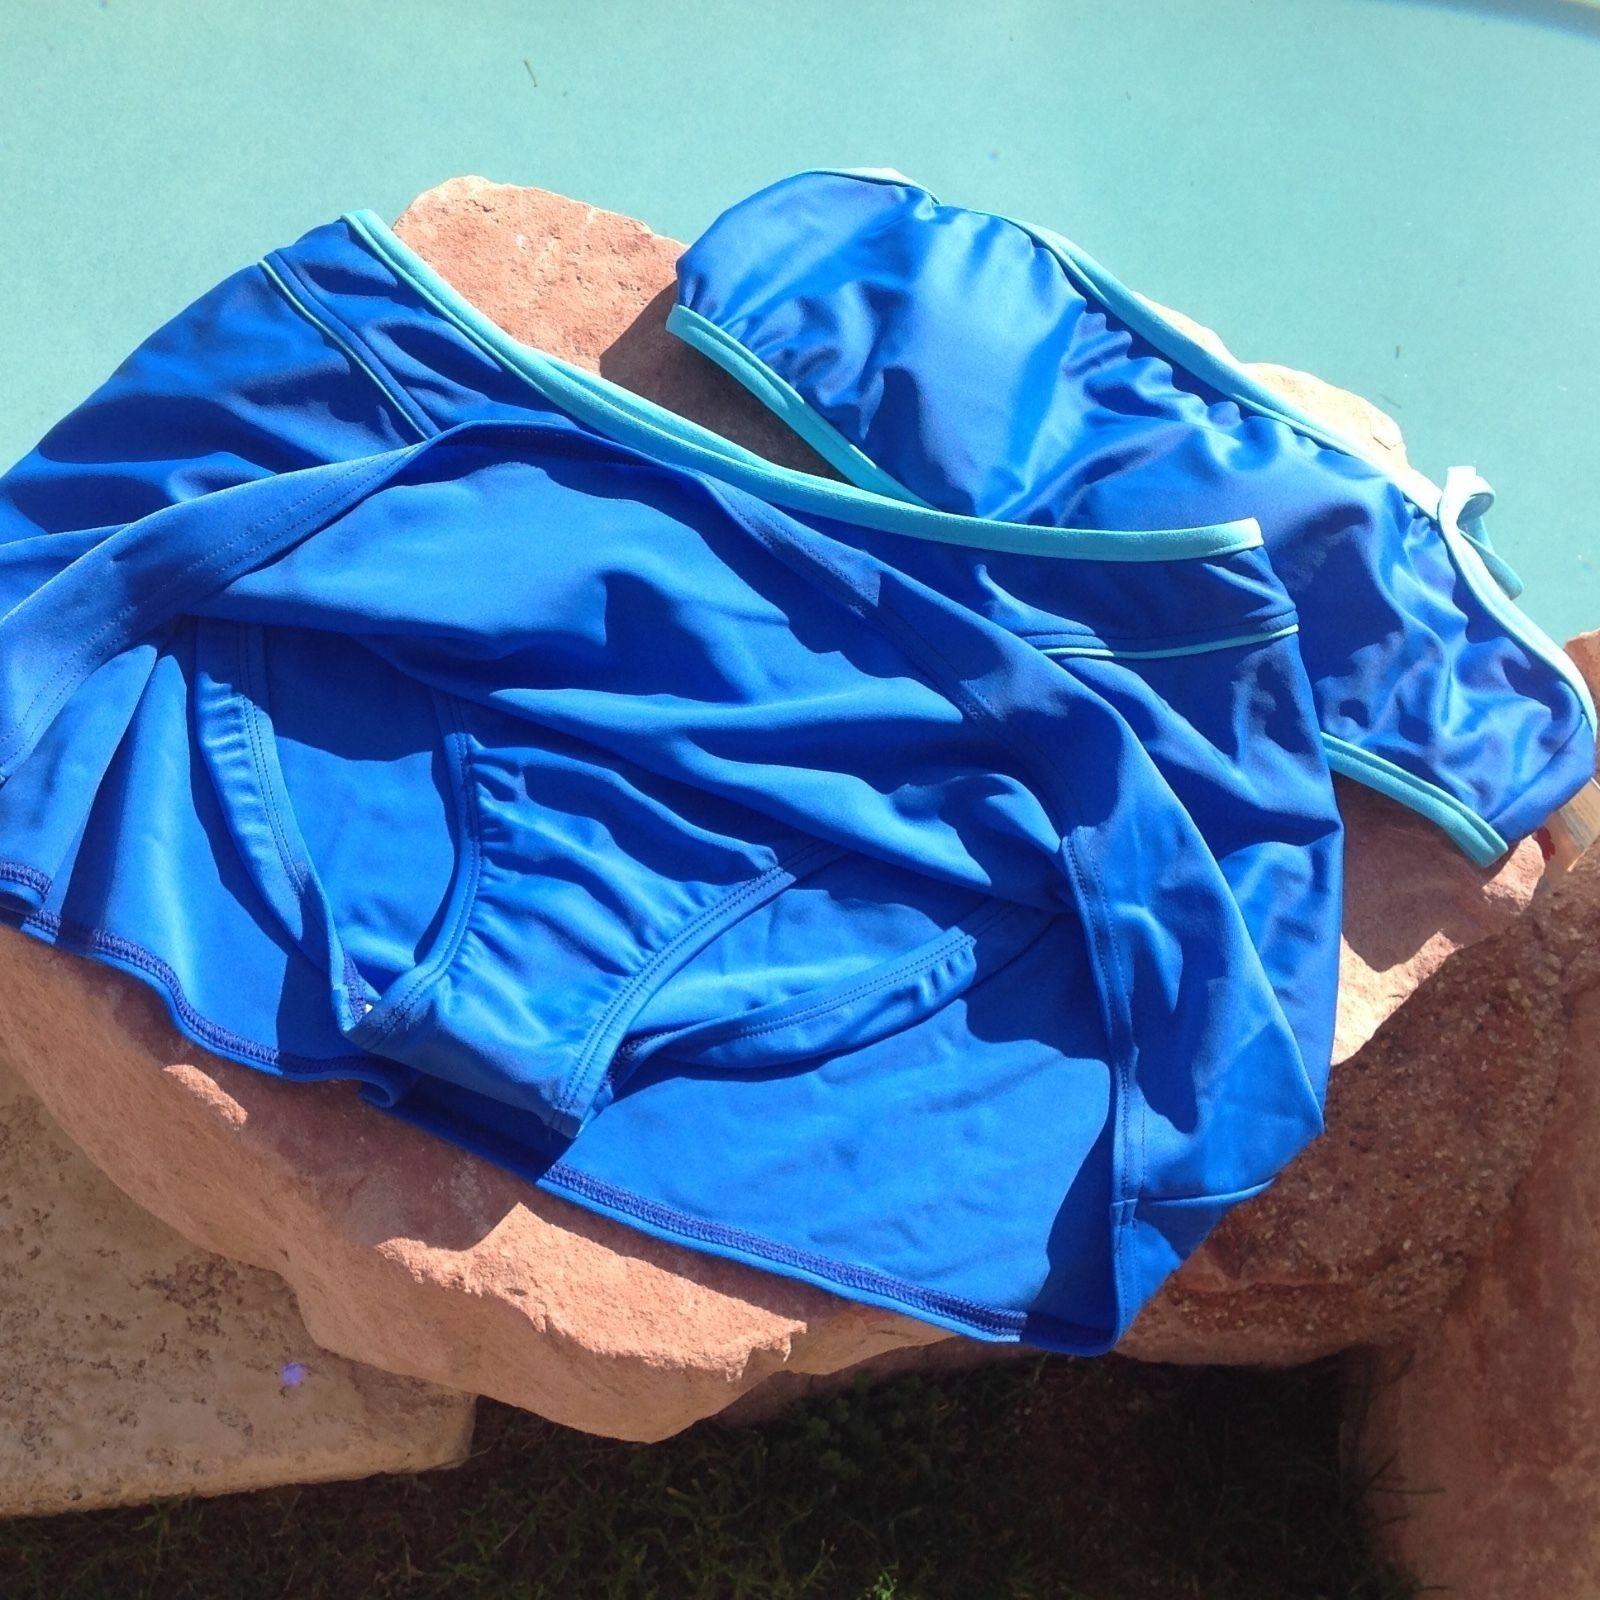 VM SPORT blueE SKIRTED SKIRTED SKIRTED SWIMWEAR BEACH BIKINI - XLARGE 16 472858